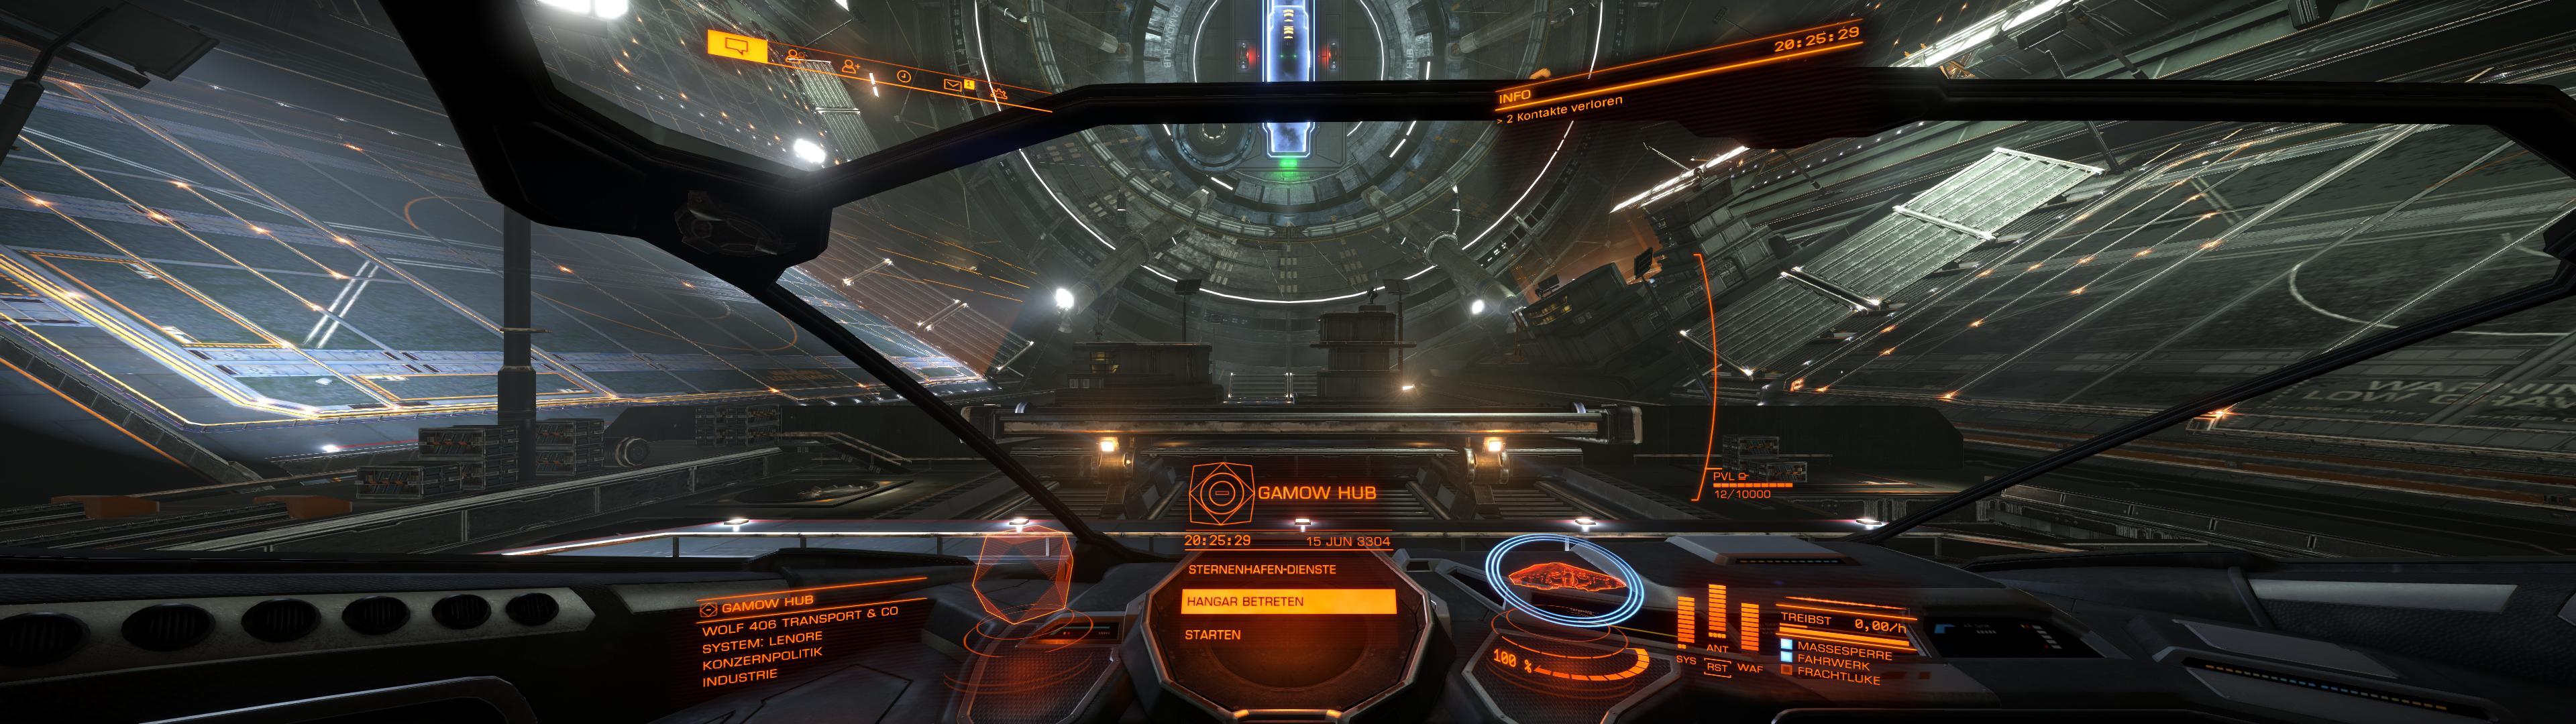 EliteDangerous64 2018-06-15 22-25-29-40.jpg